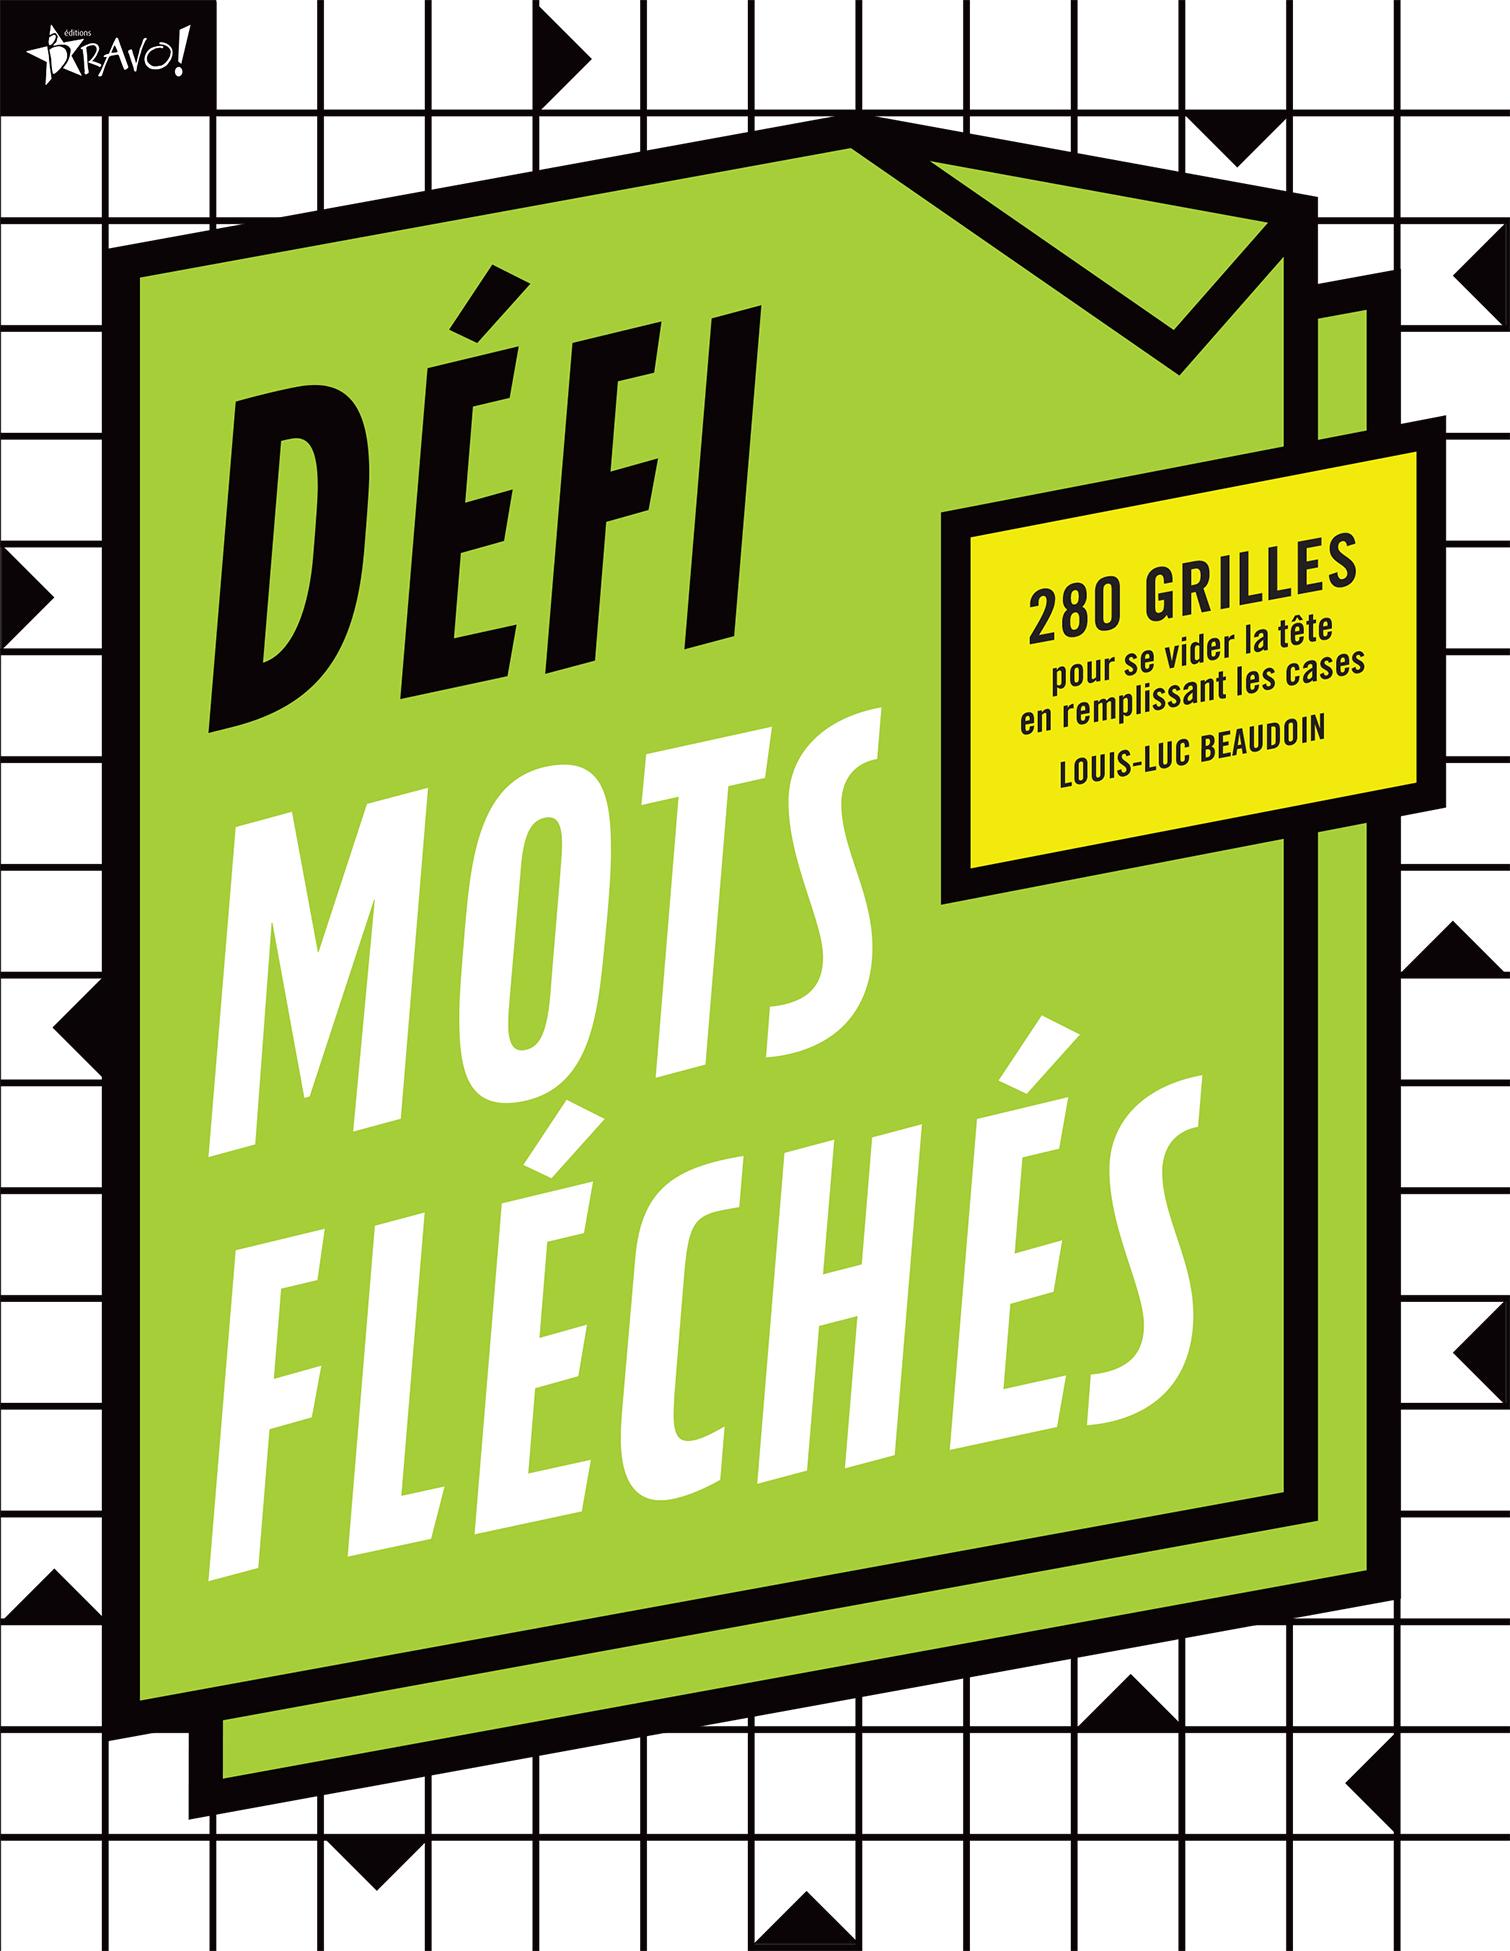 297_DefiMotsFleches_C1